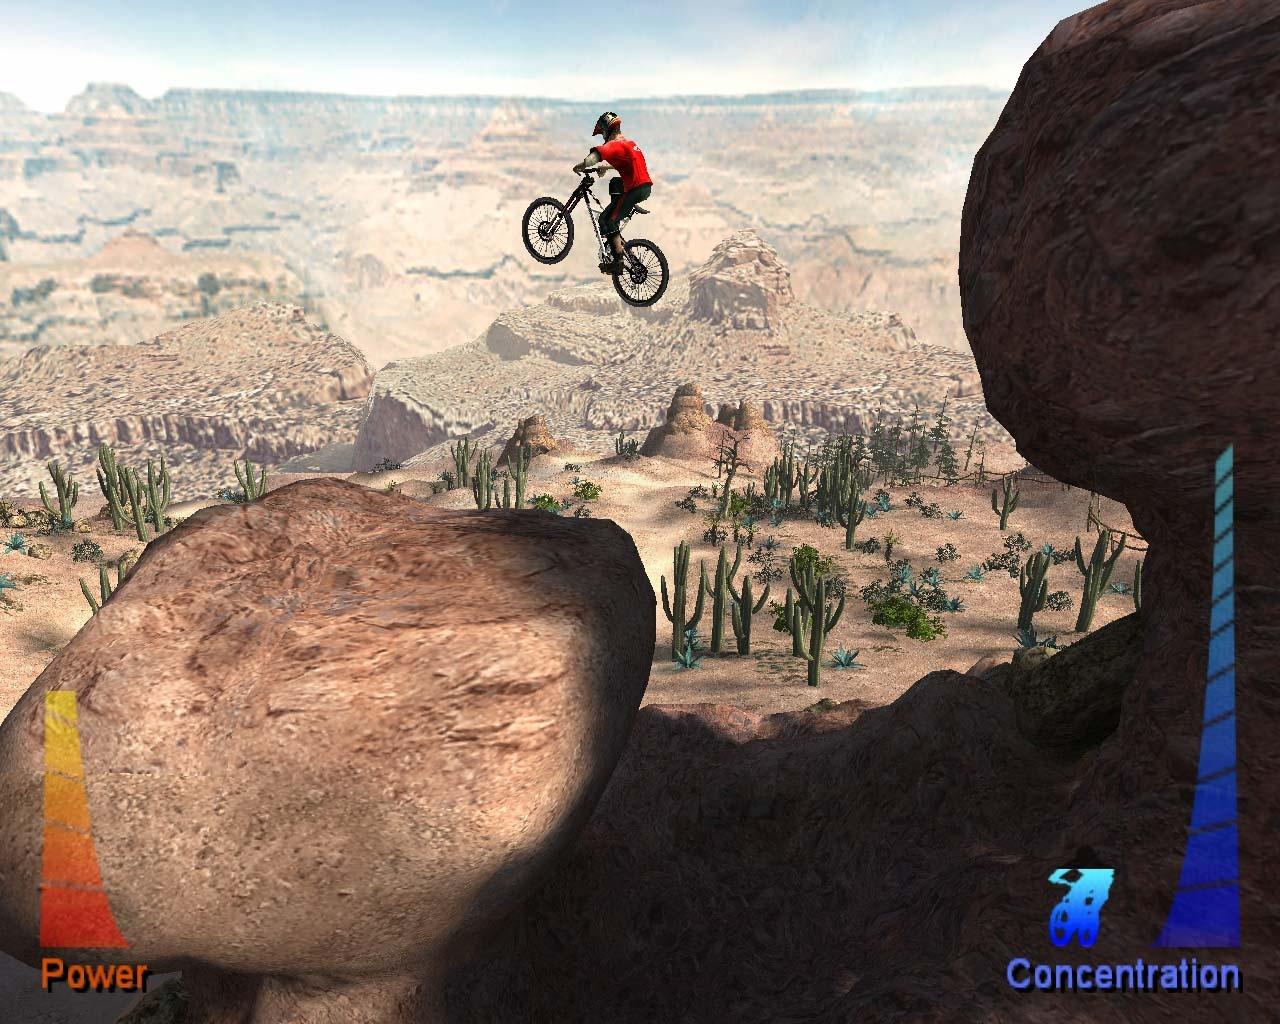 http://1.bp.blogspot.com/-aehtAtoWLcU/T5R3xQYJmrI/AAAAAAAAAuo/lH7C7iR8AZs/s1600/Mountain+Bike+Adrenaline1.jpg